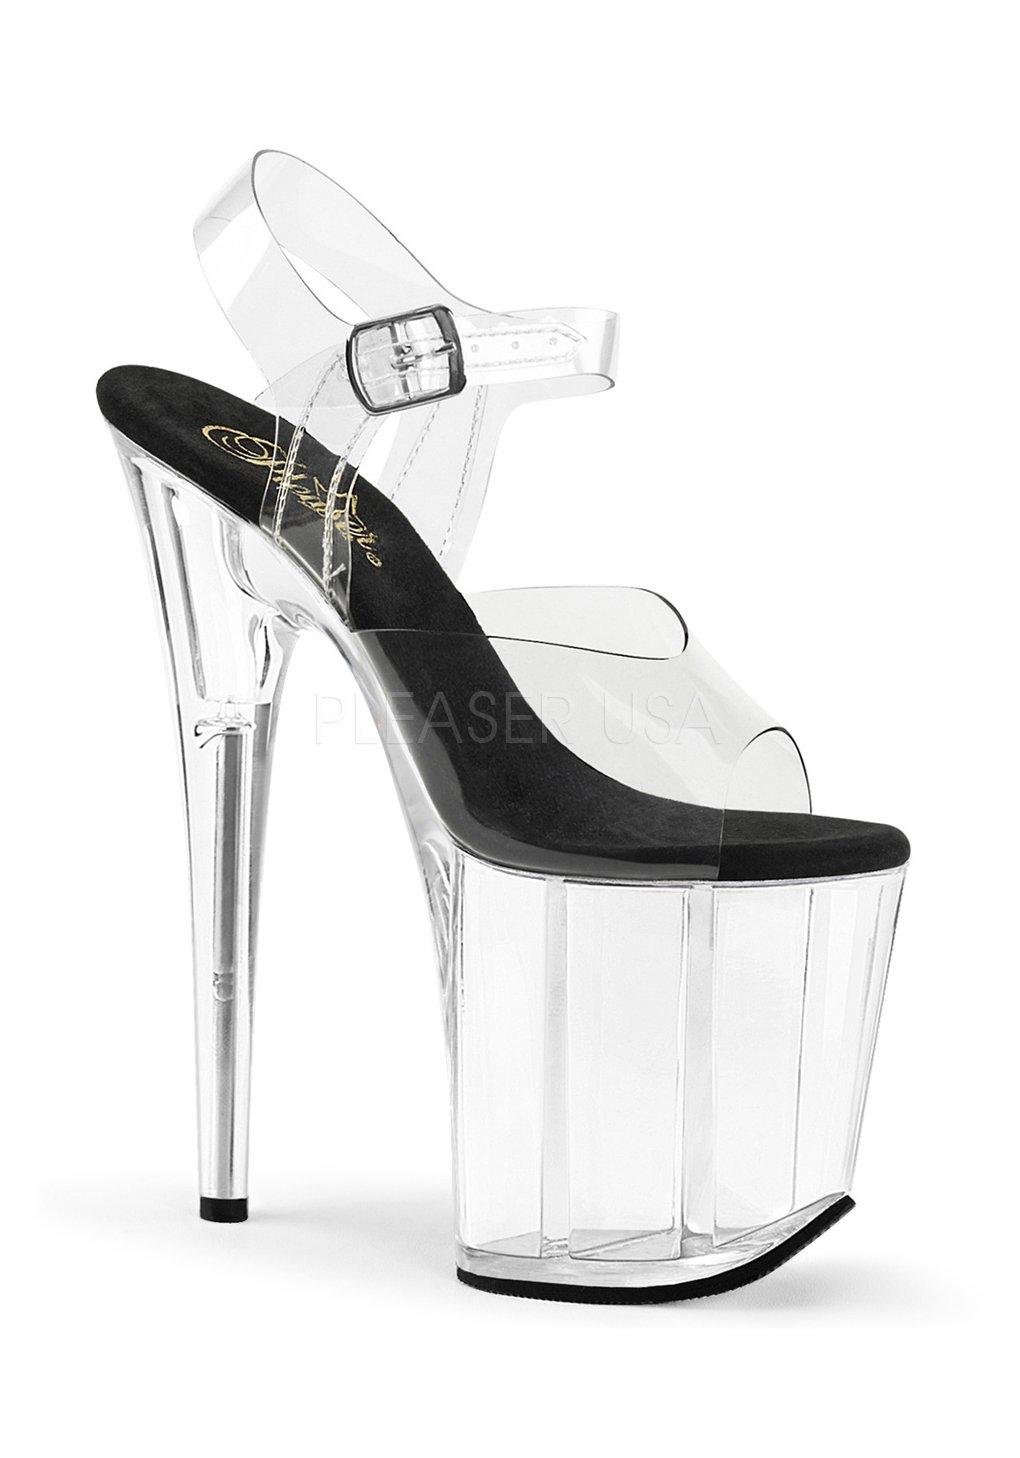 Pleaser Women's Flamingo-808 Platform Sandal B07DKQW5W6 11 B(M) US|Clear-black/Clear